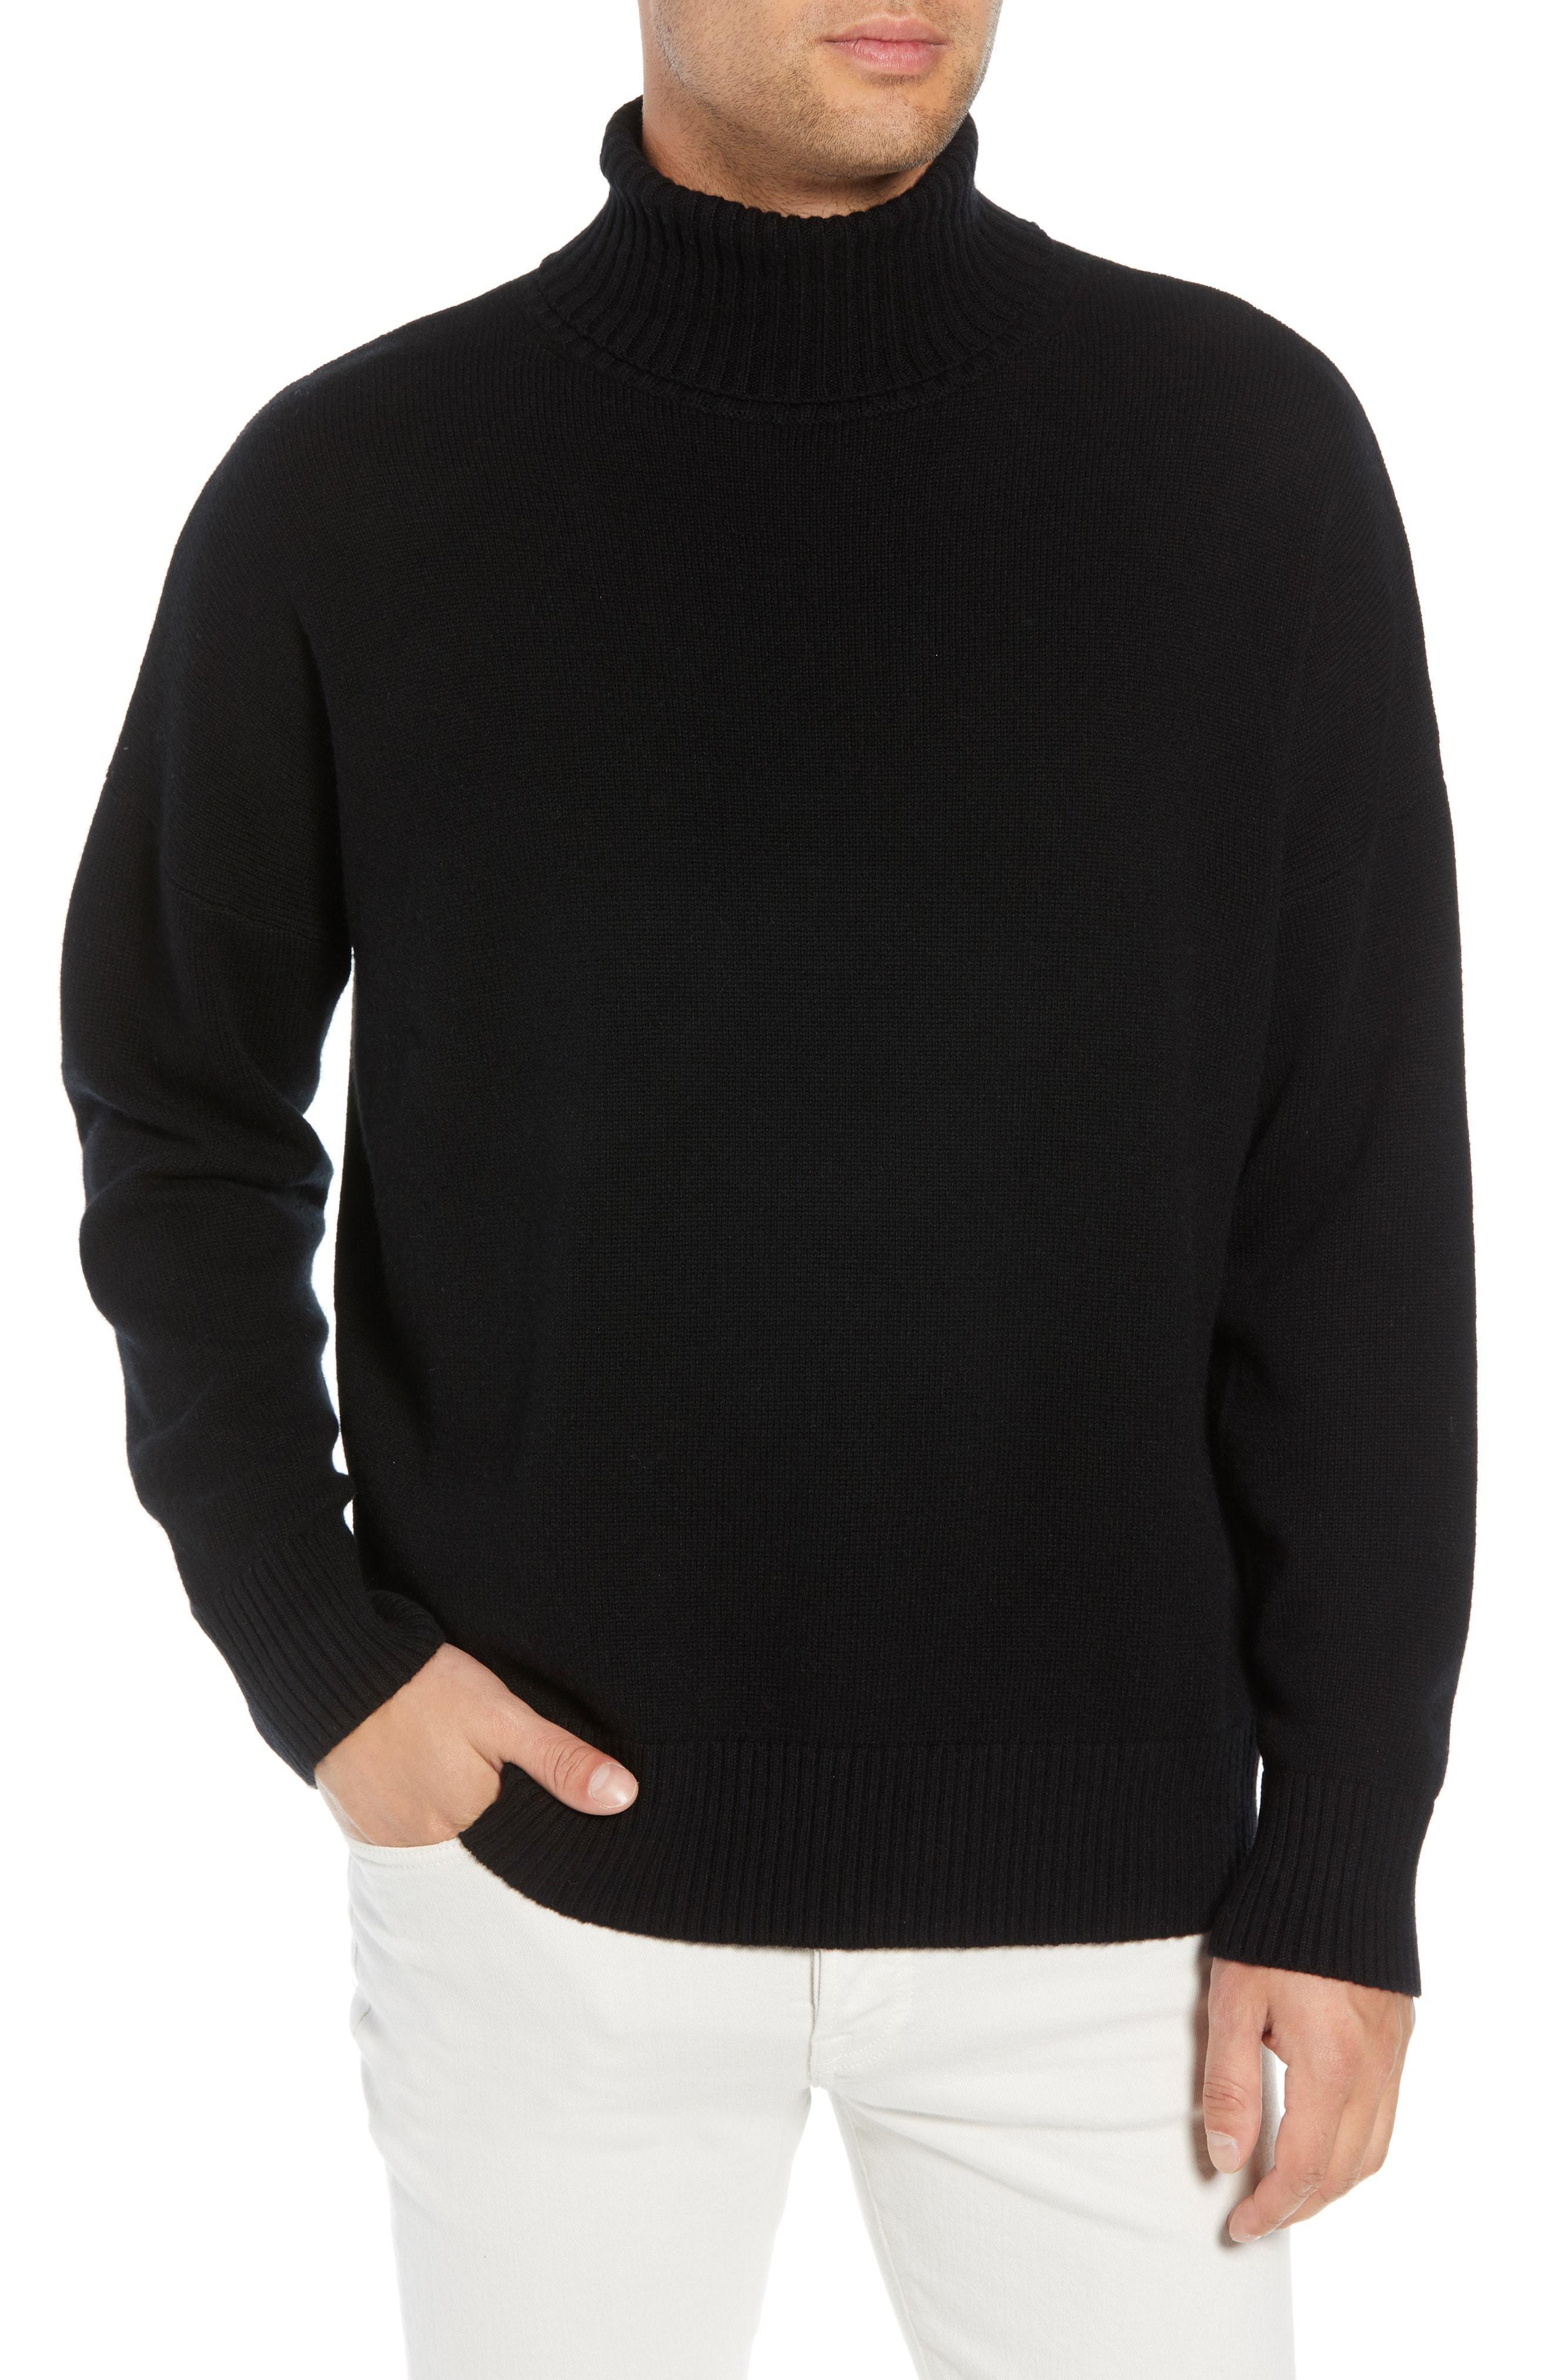 The Kooples Wool Cashmere Turtleneck Sweater